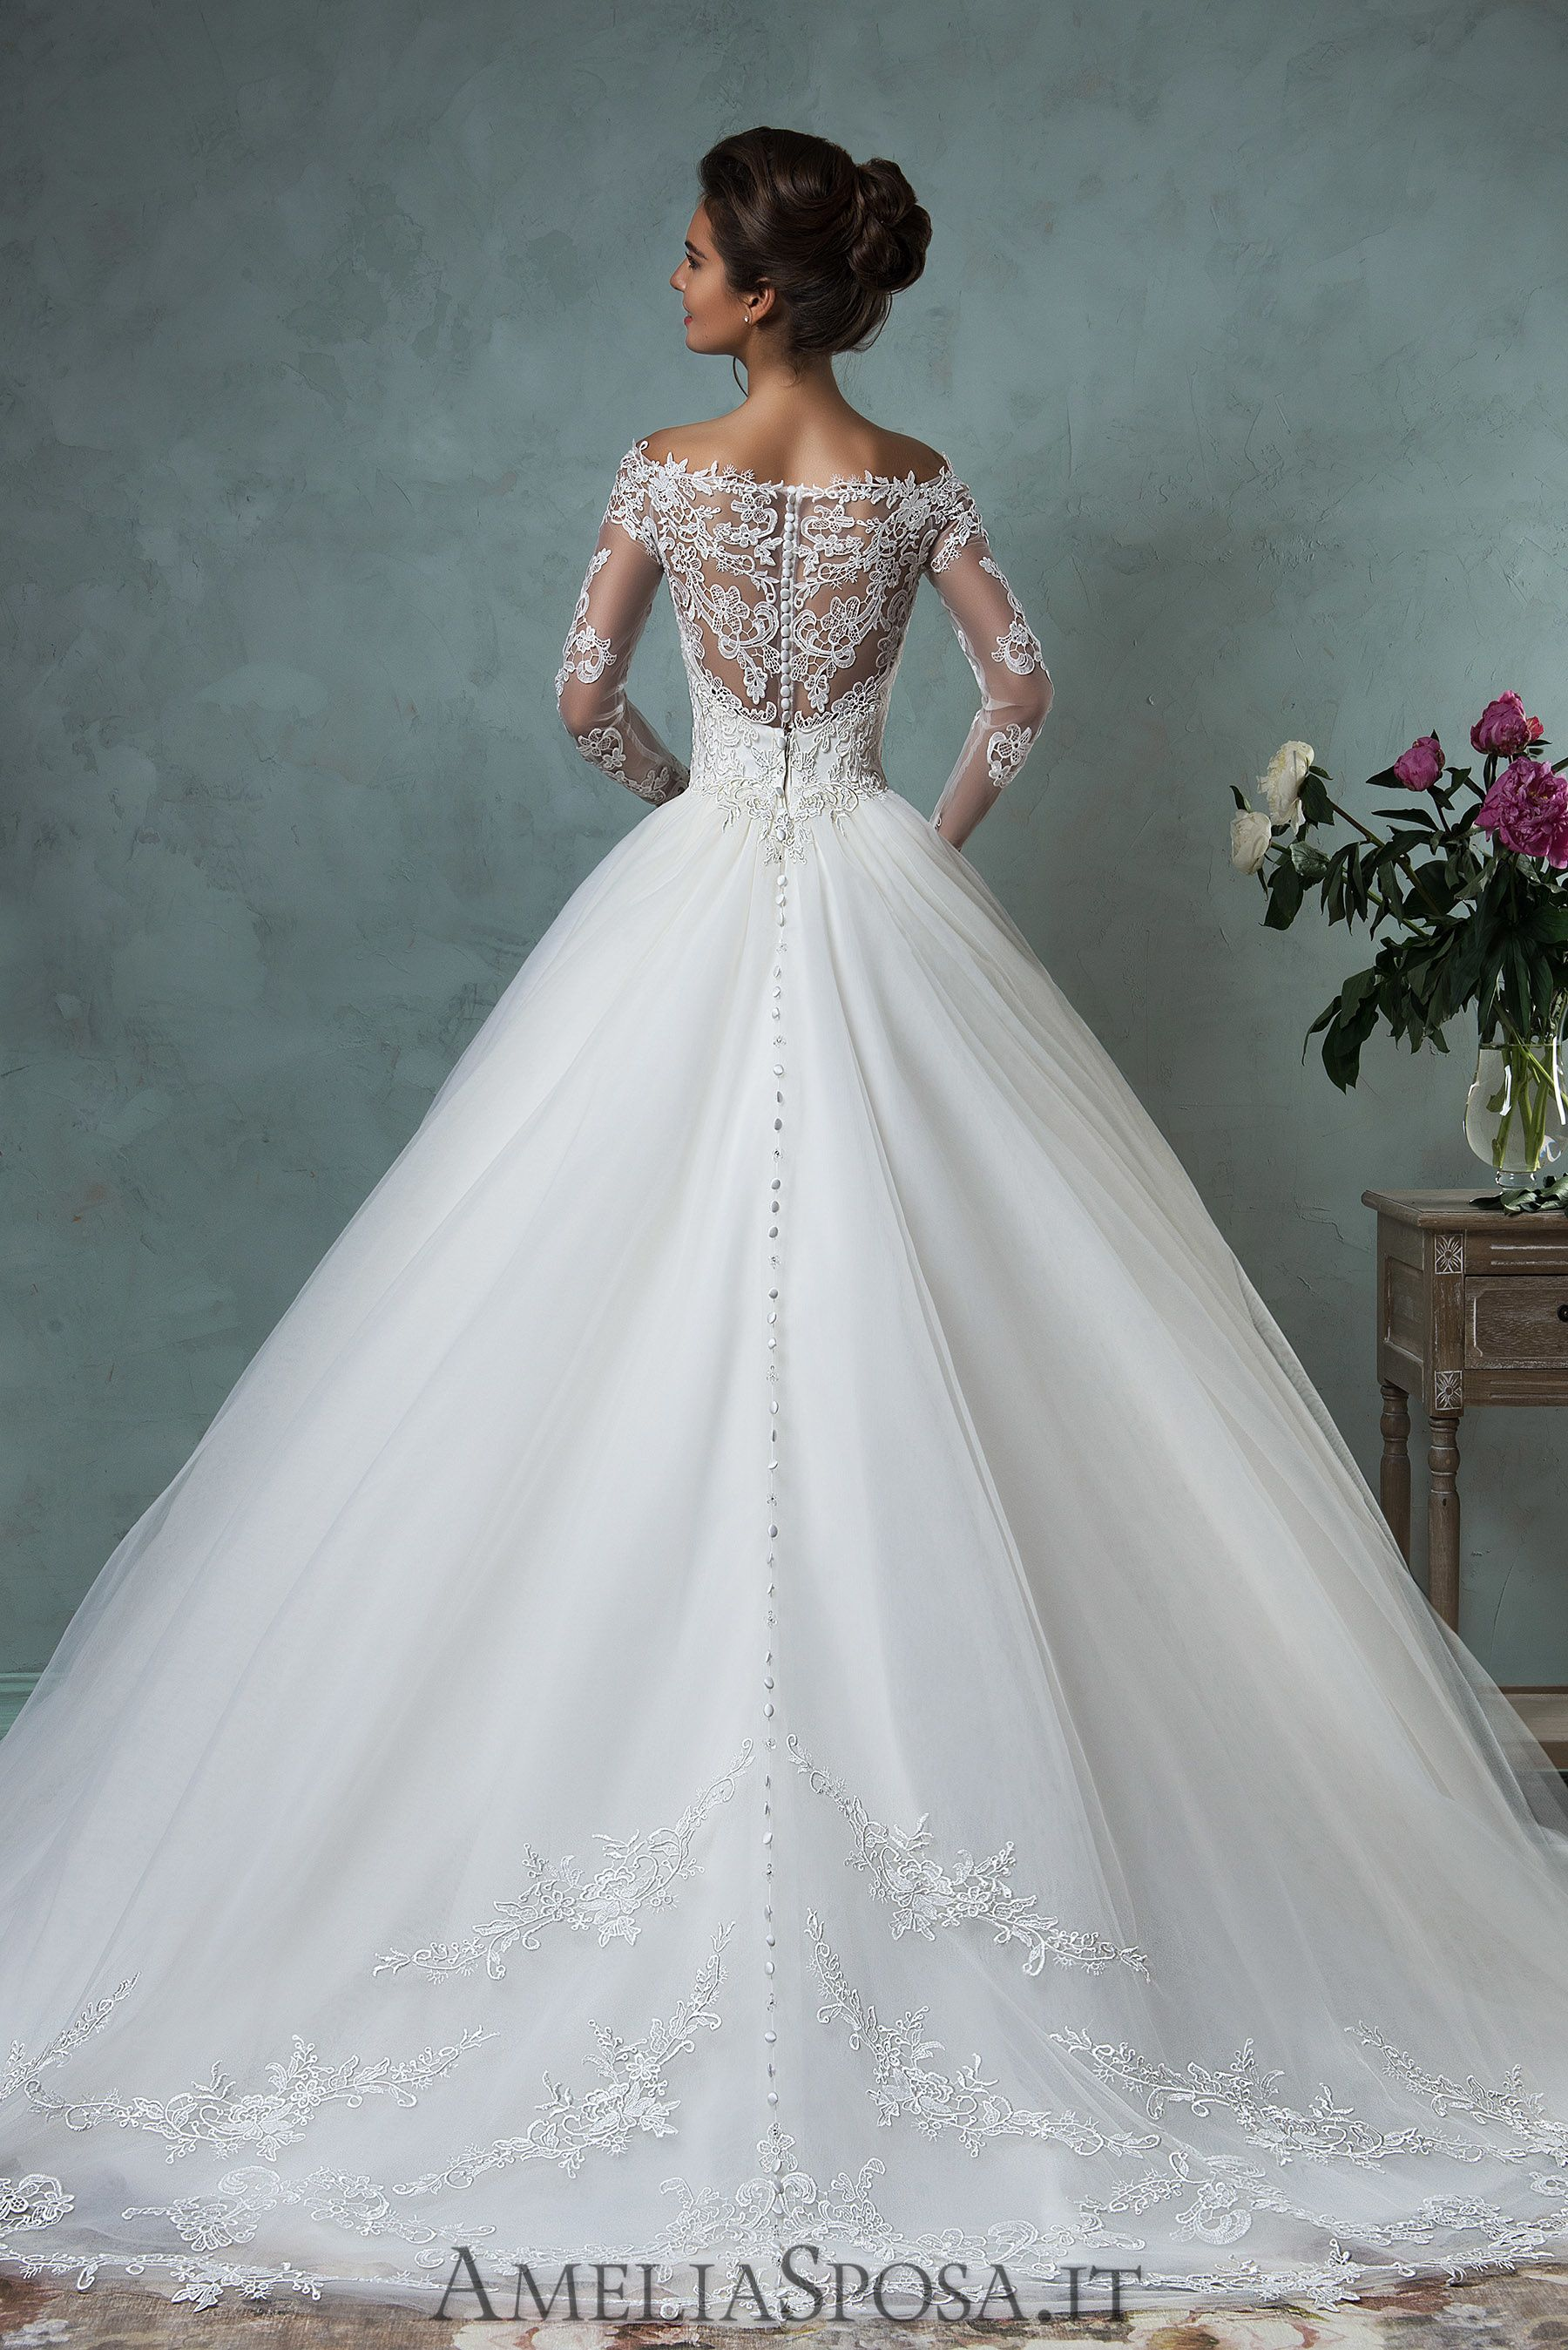 Wedding Dress Nova, Silhouette: A-line, Ball Gown | Bridal Gowns ...